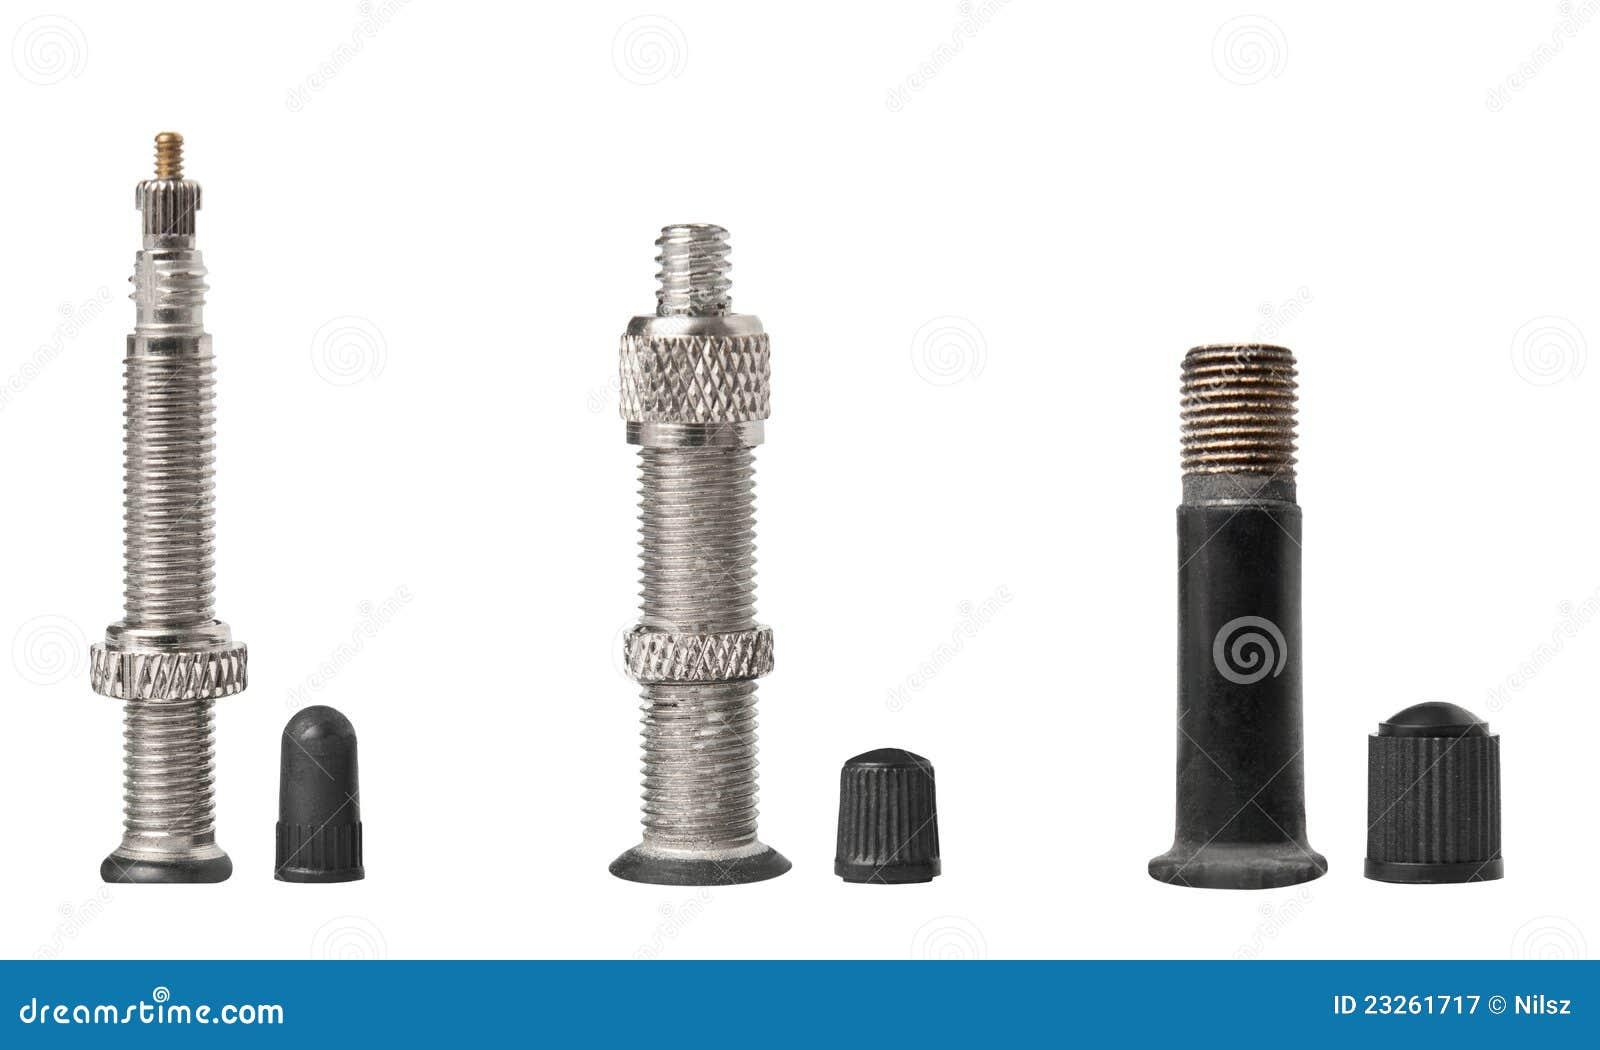 Bicycle sclaverand dunlop schrader valve stock image